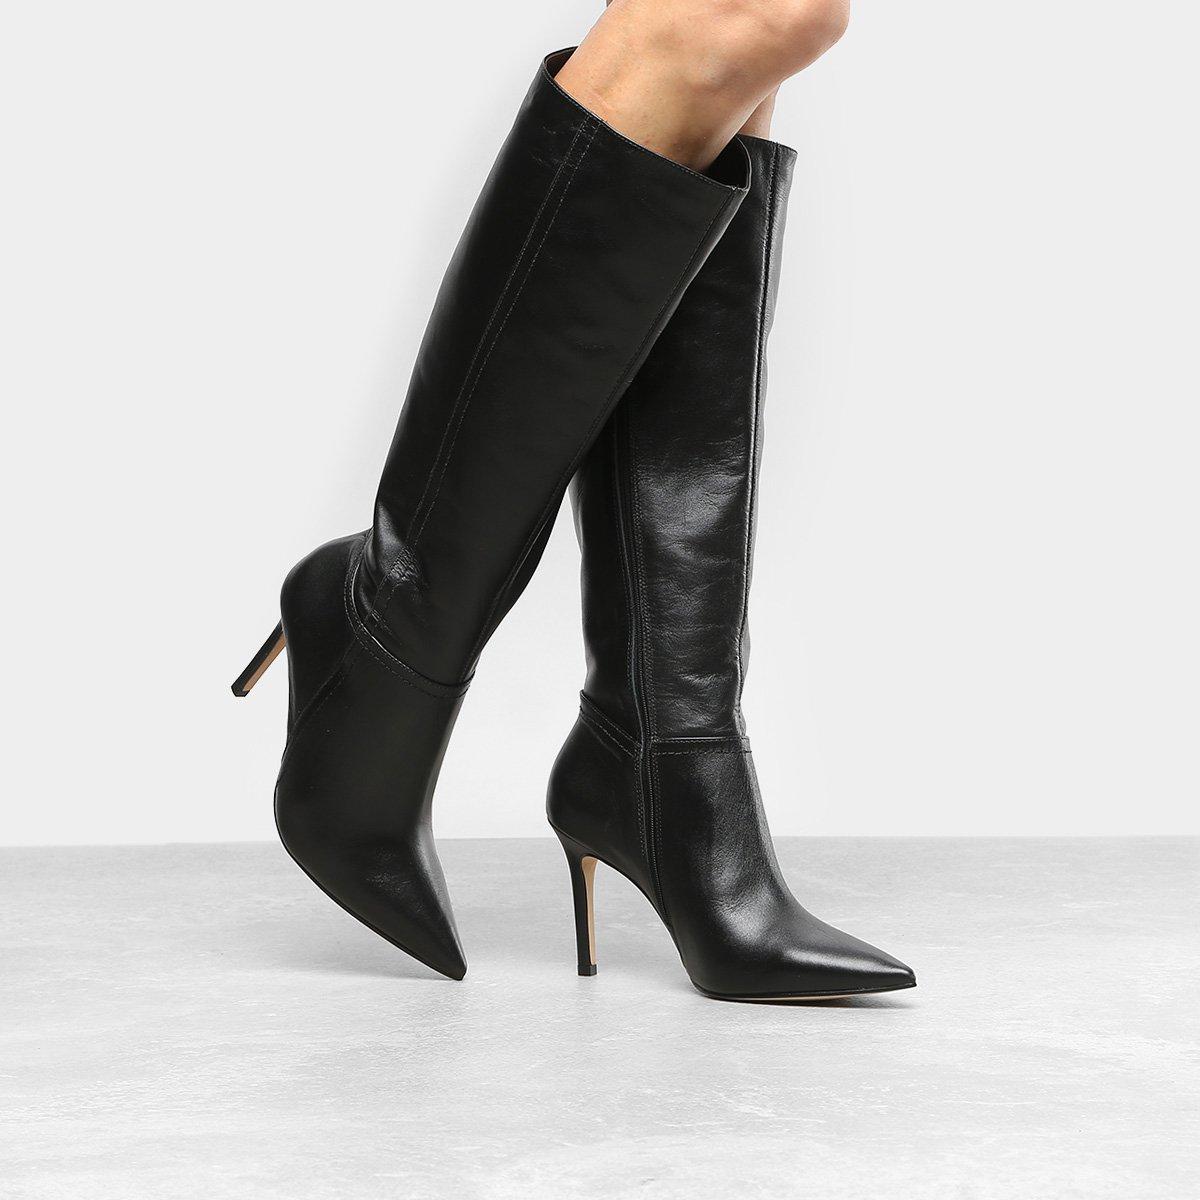 3995760ba Bota Couro Cano Longo Shoestock Salto Fino Feminina | Shoestock